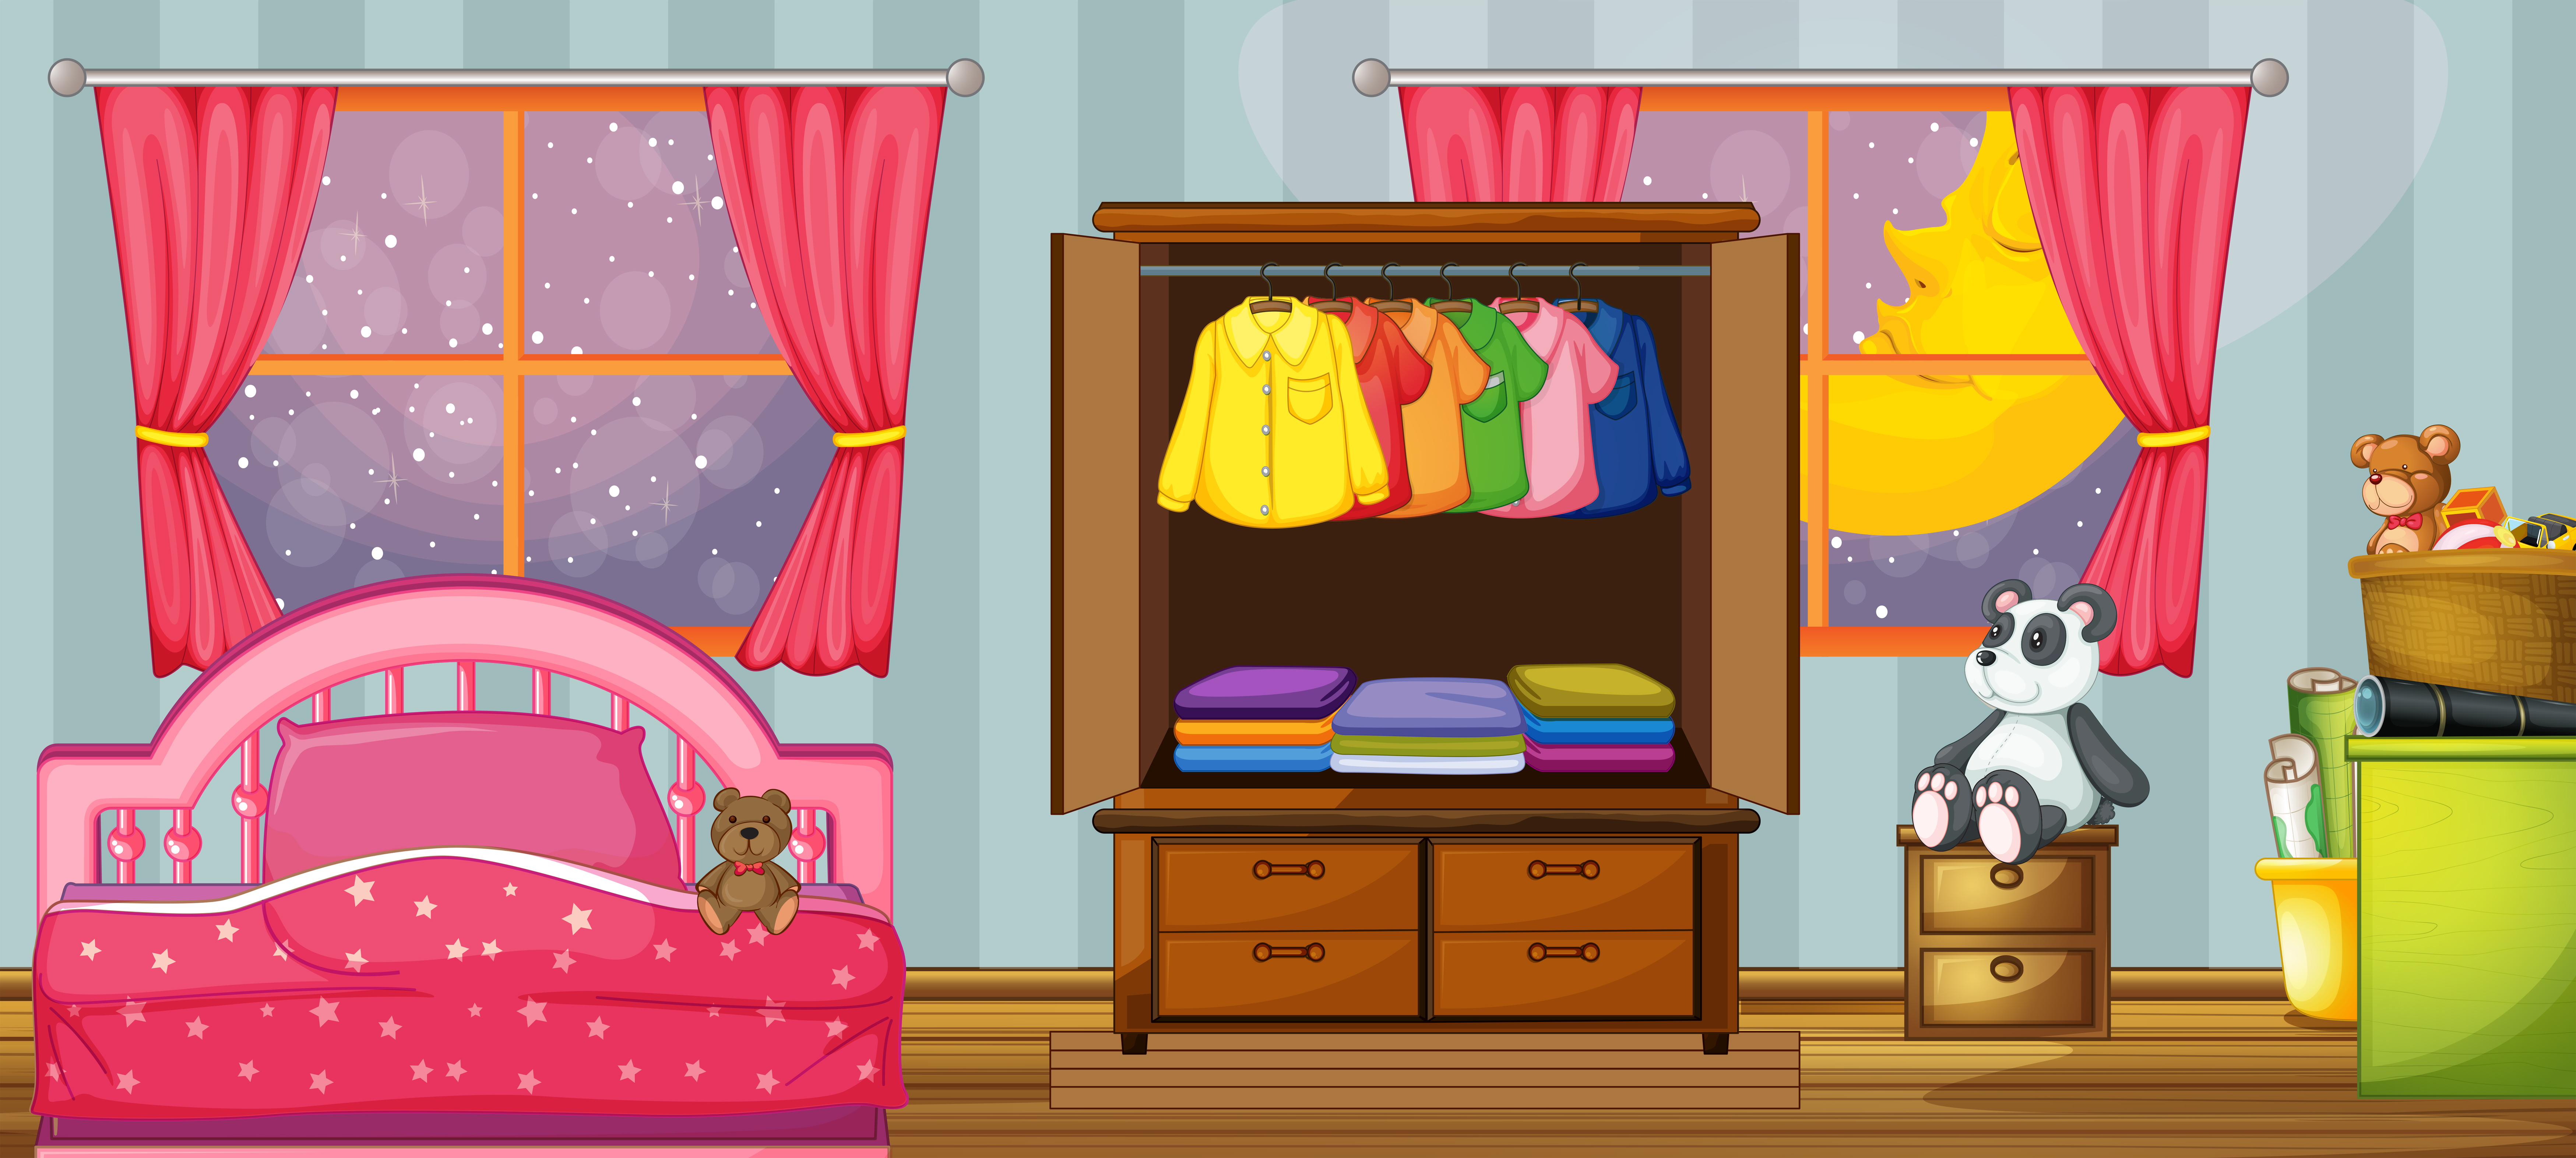 a child bedroom template 359876 vector art at vecteezy